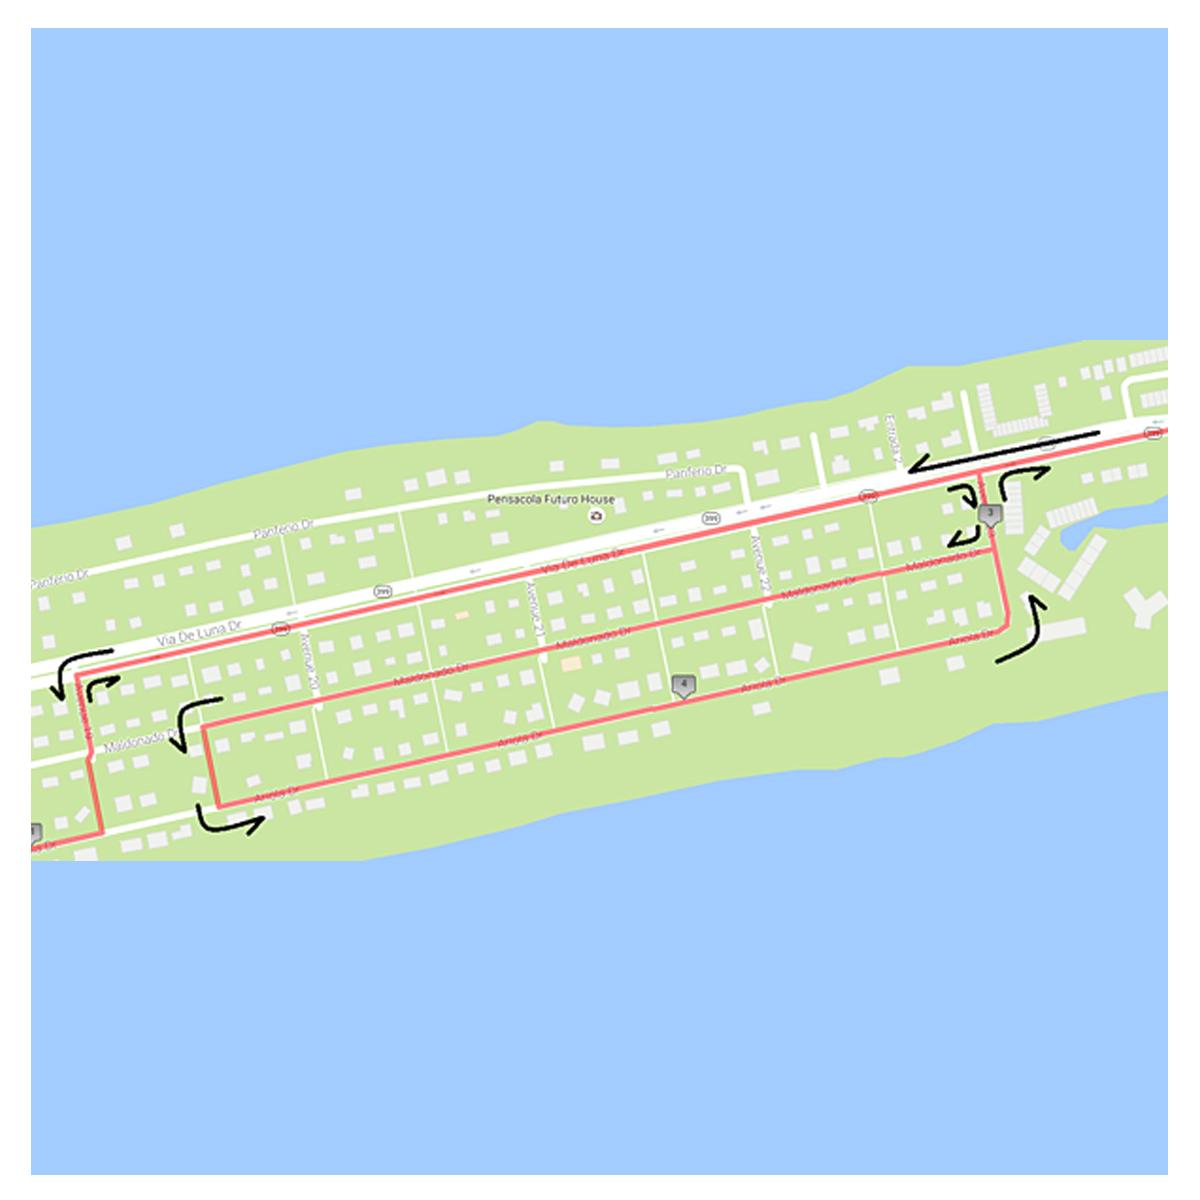 2017 MV Sports Parking Map